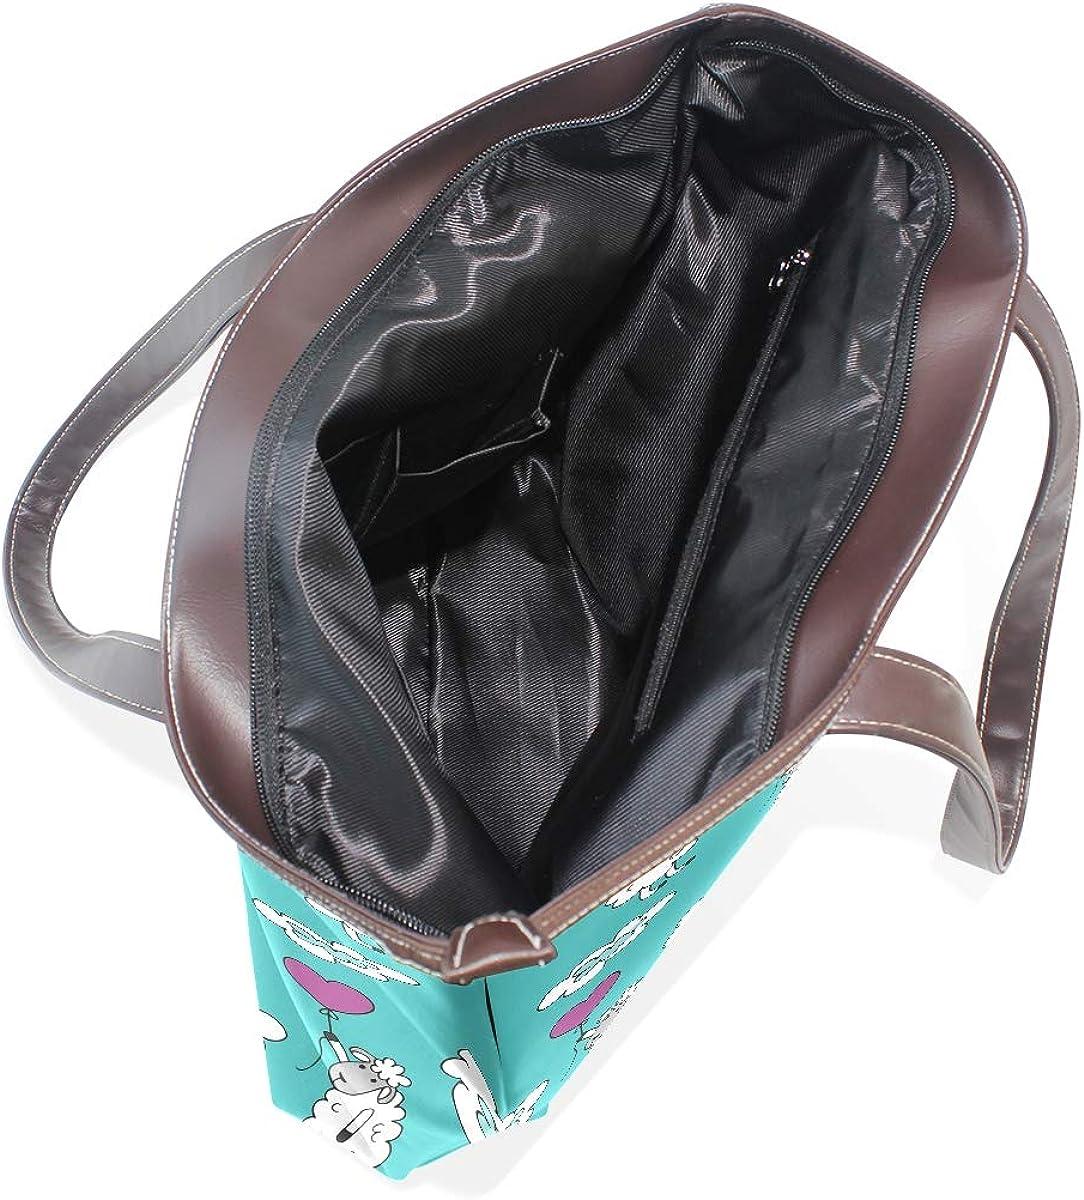 Holding A Balloon Lambs Womens Leather Handbag Shoulder Bag Satchel Handbags Leather Tote Purse Women Handle Handbags